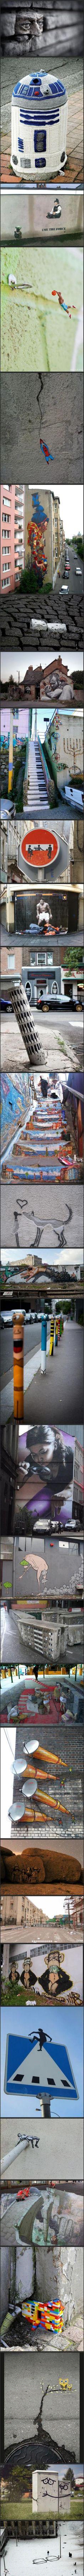 Straßenkunst - Win Bild | Webfail - Fail Bilder und Fail Videos